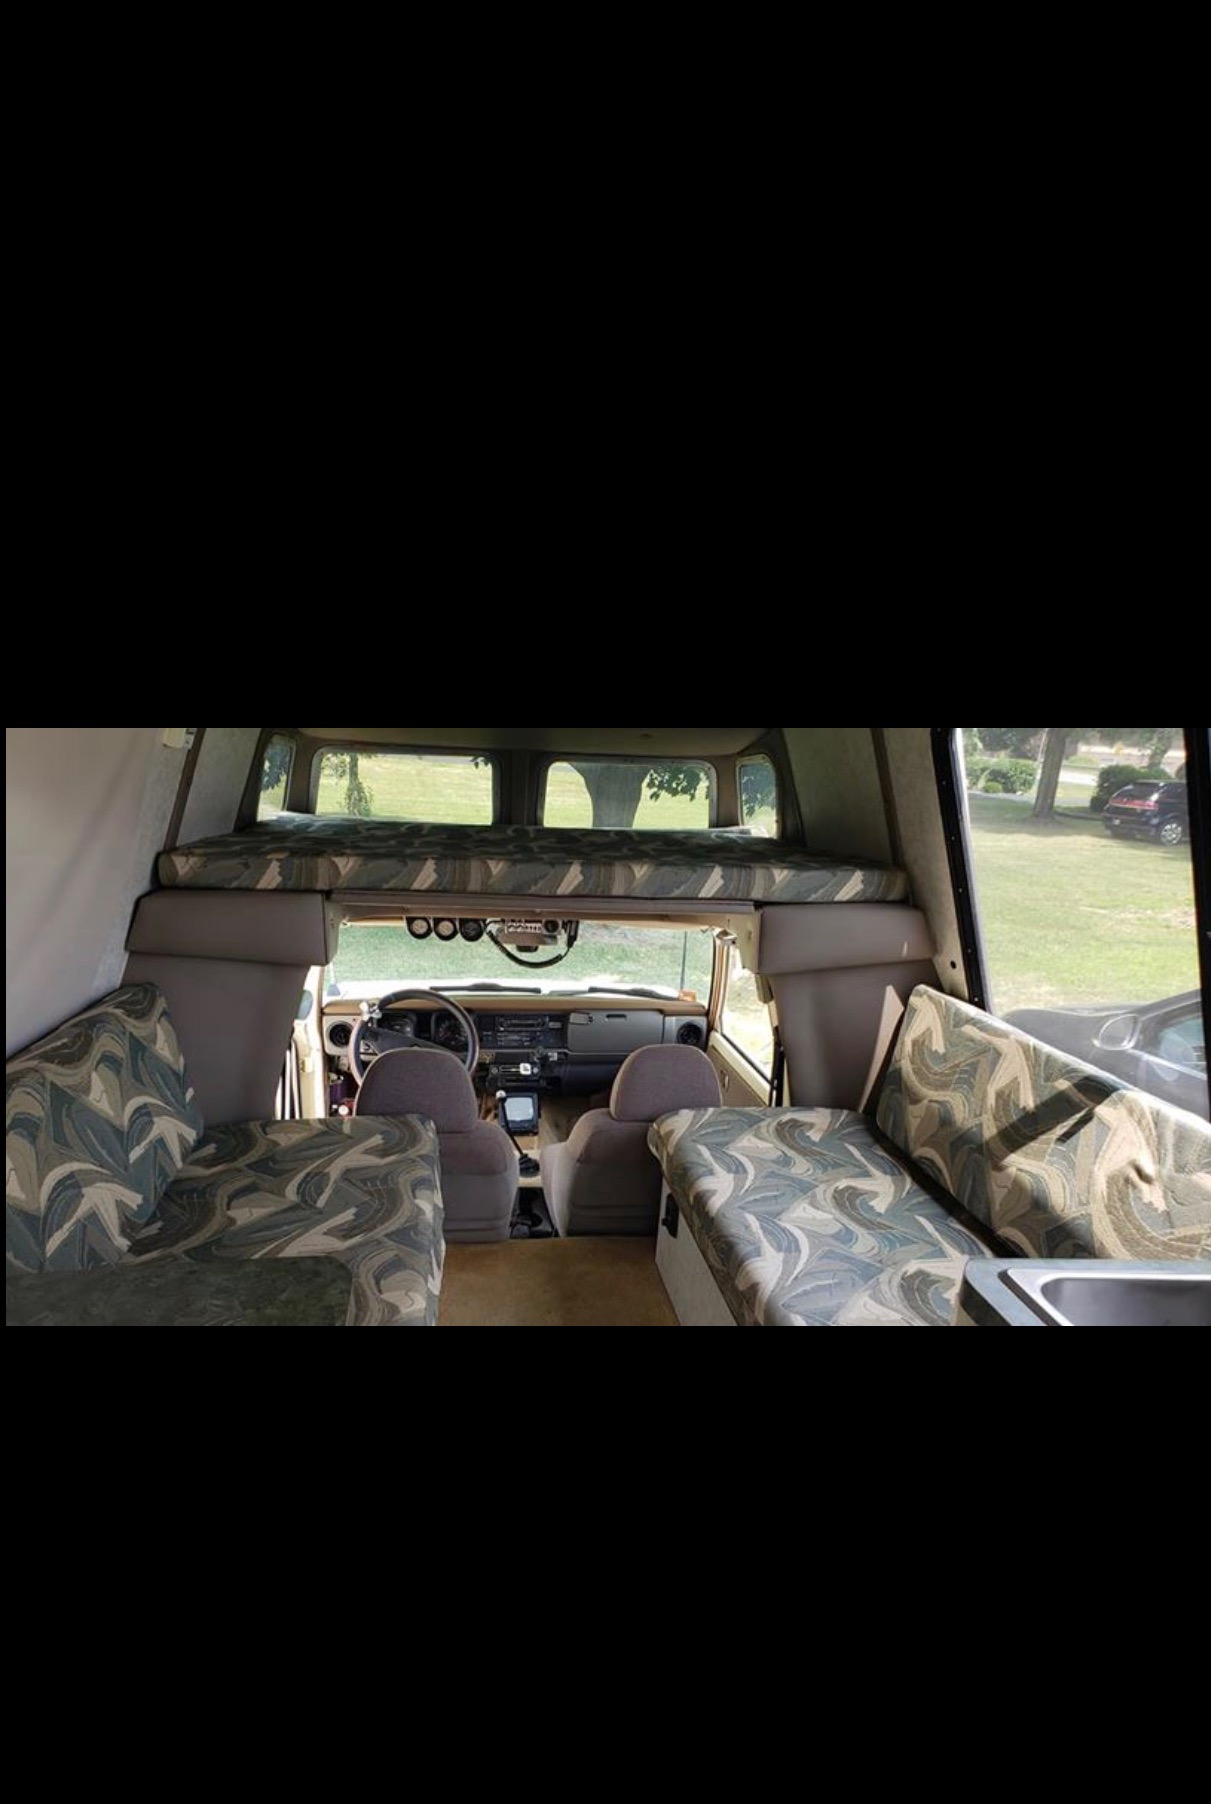 1978 Chinook Interior.JPG